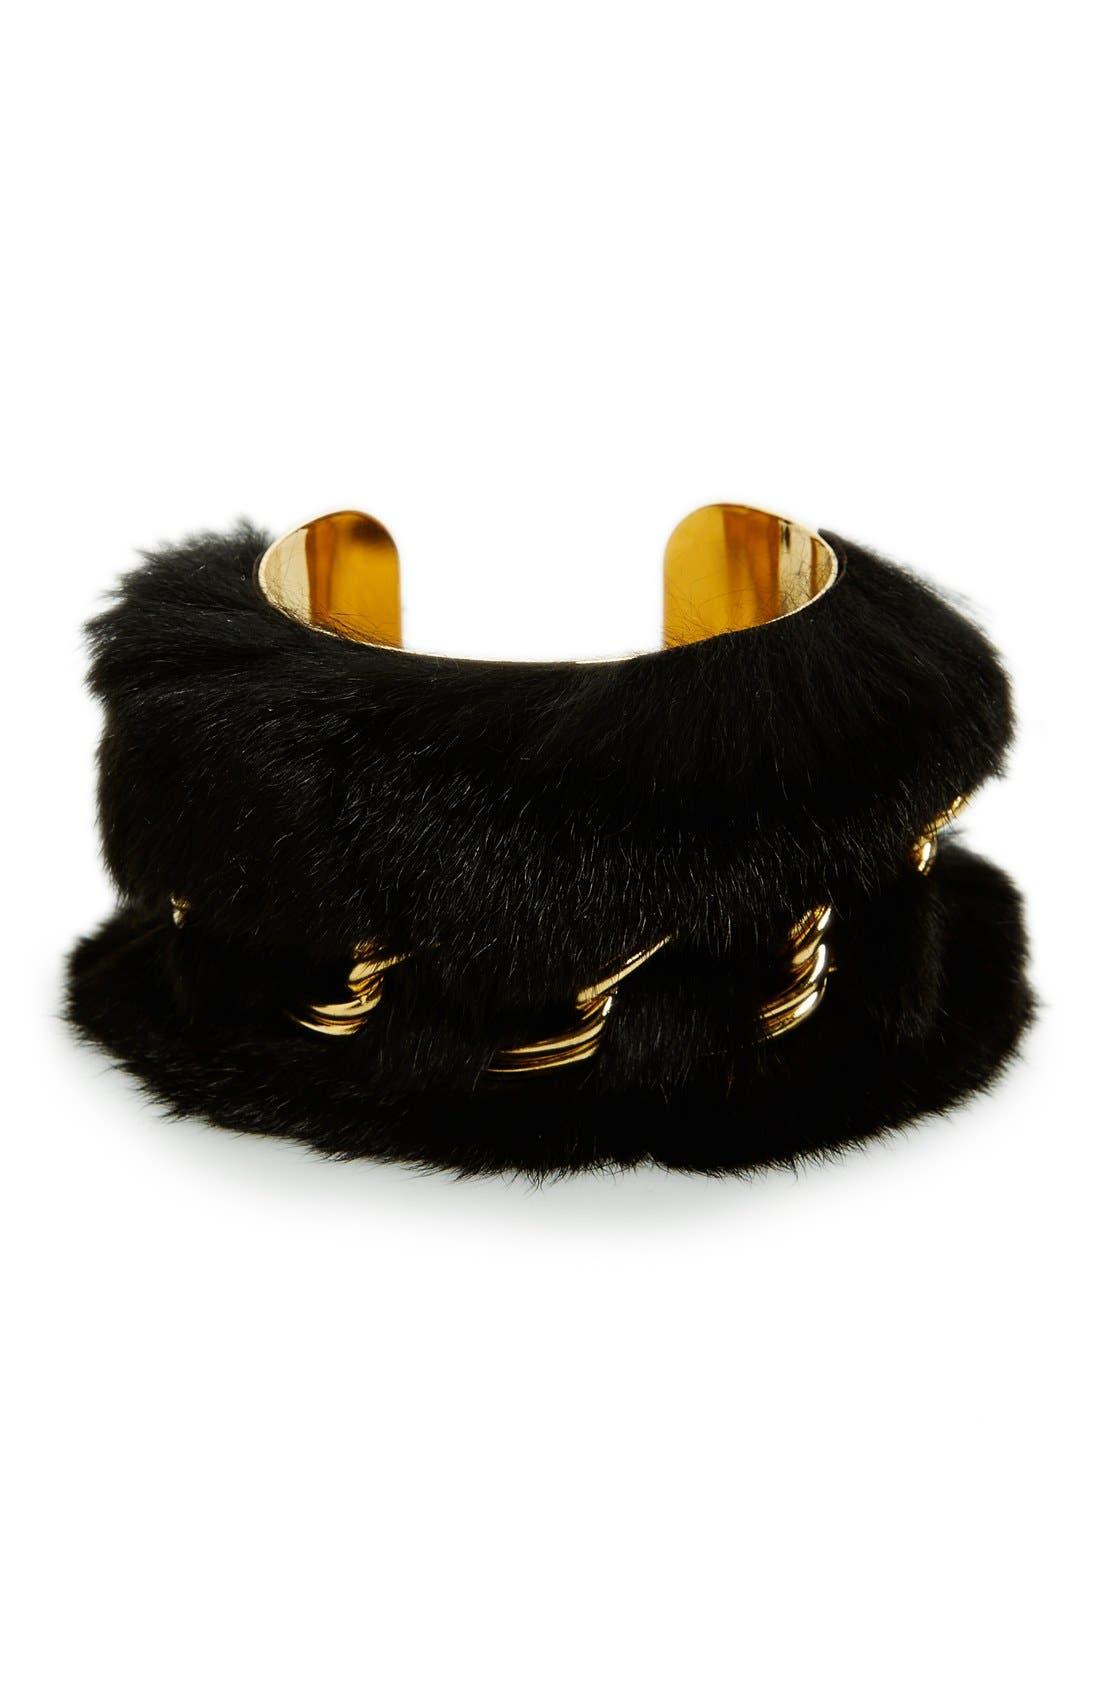 Alternate Image 1 Selected - Tuleste Genuine Rabbit Fur & Chain Wide Cuff